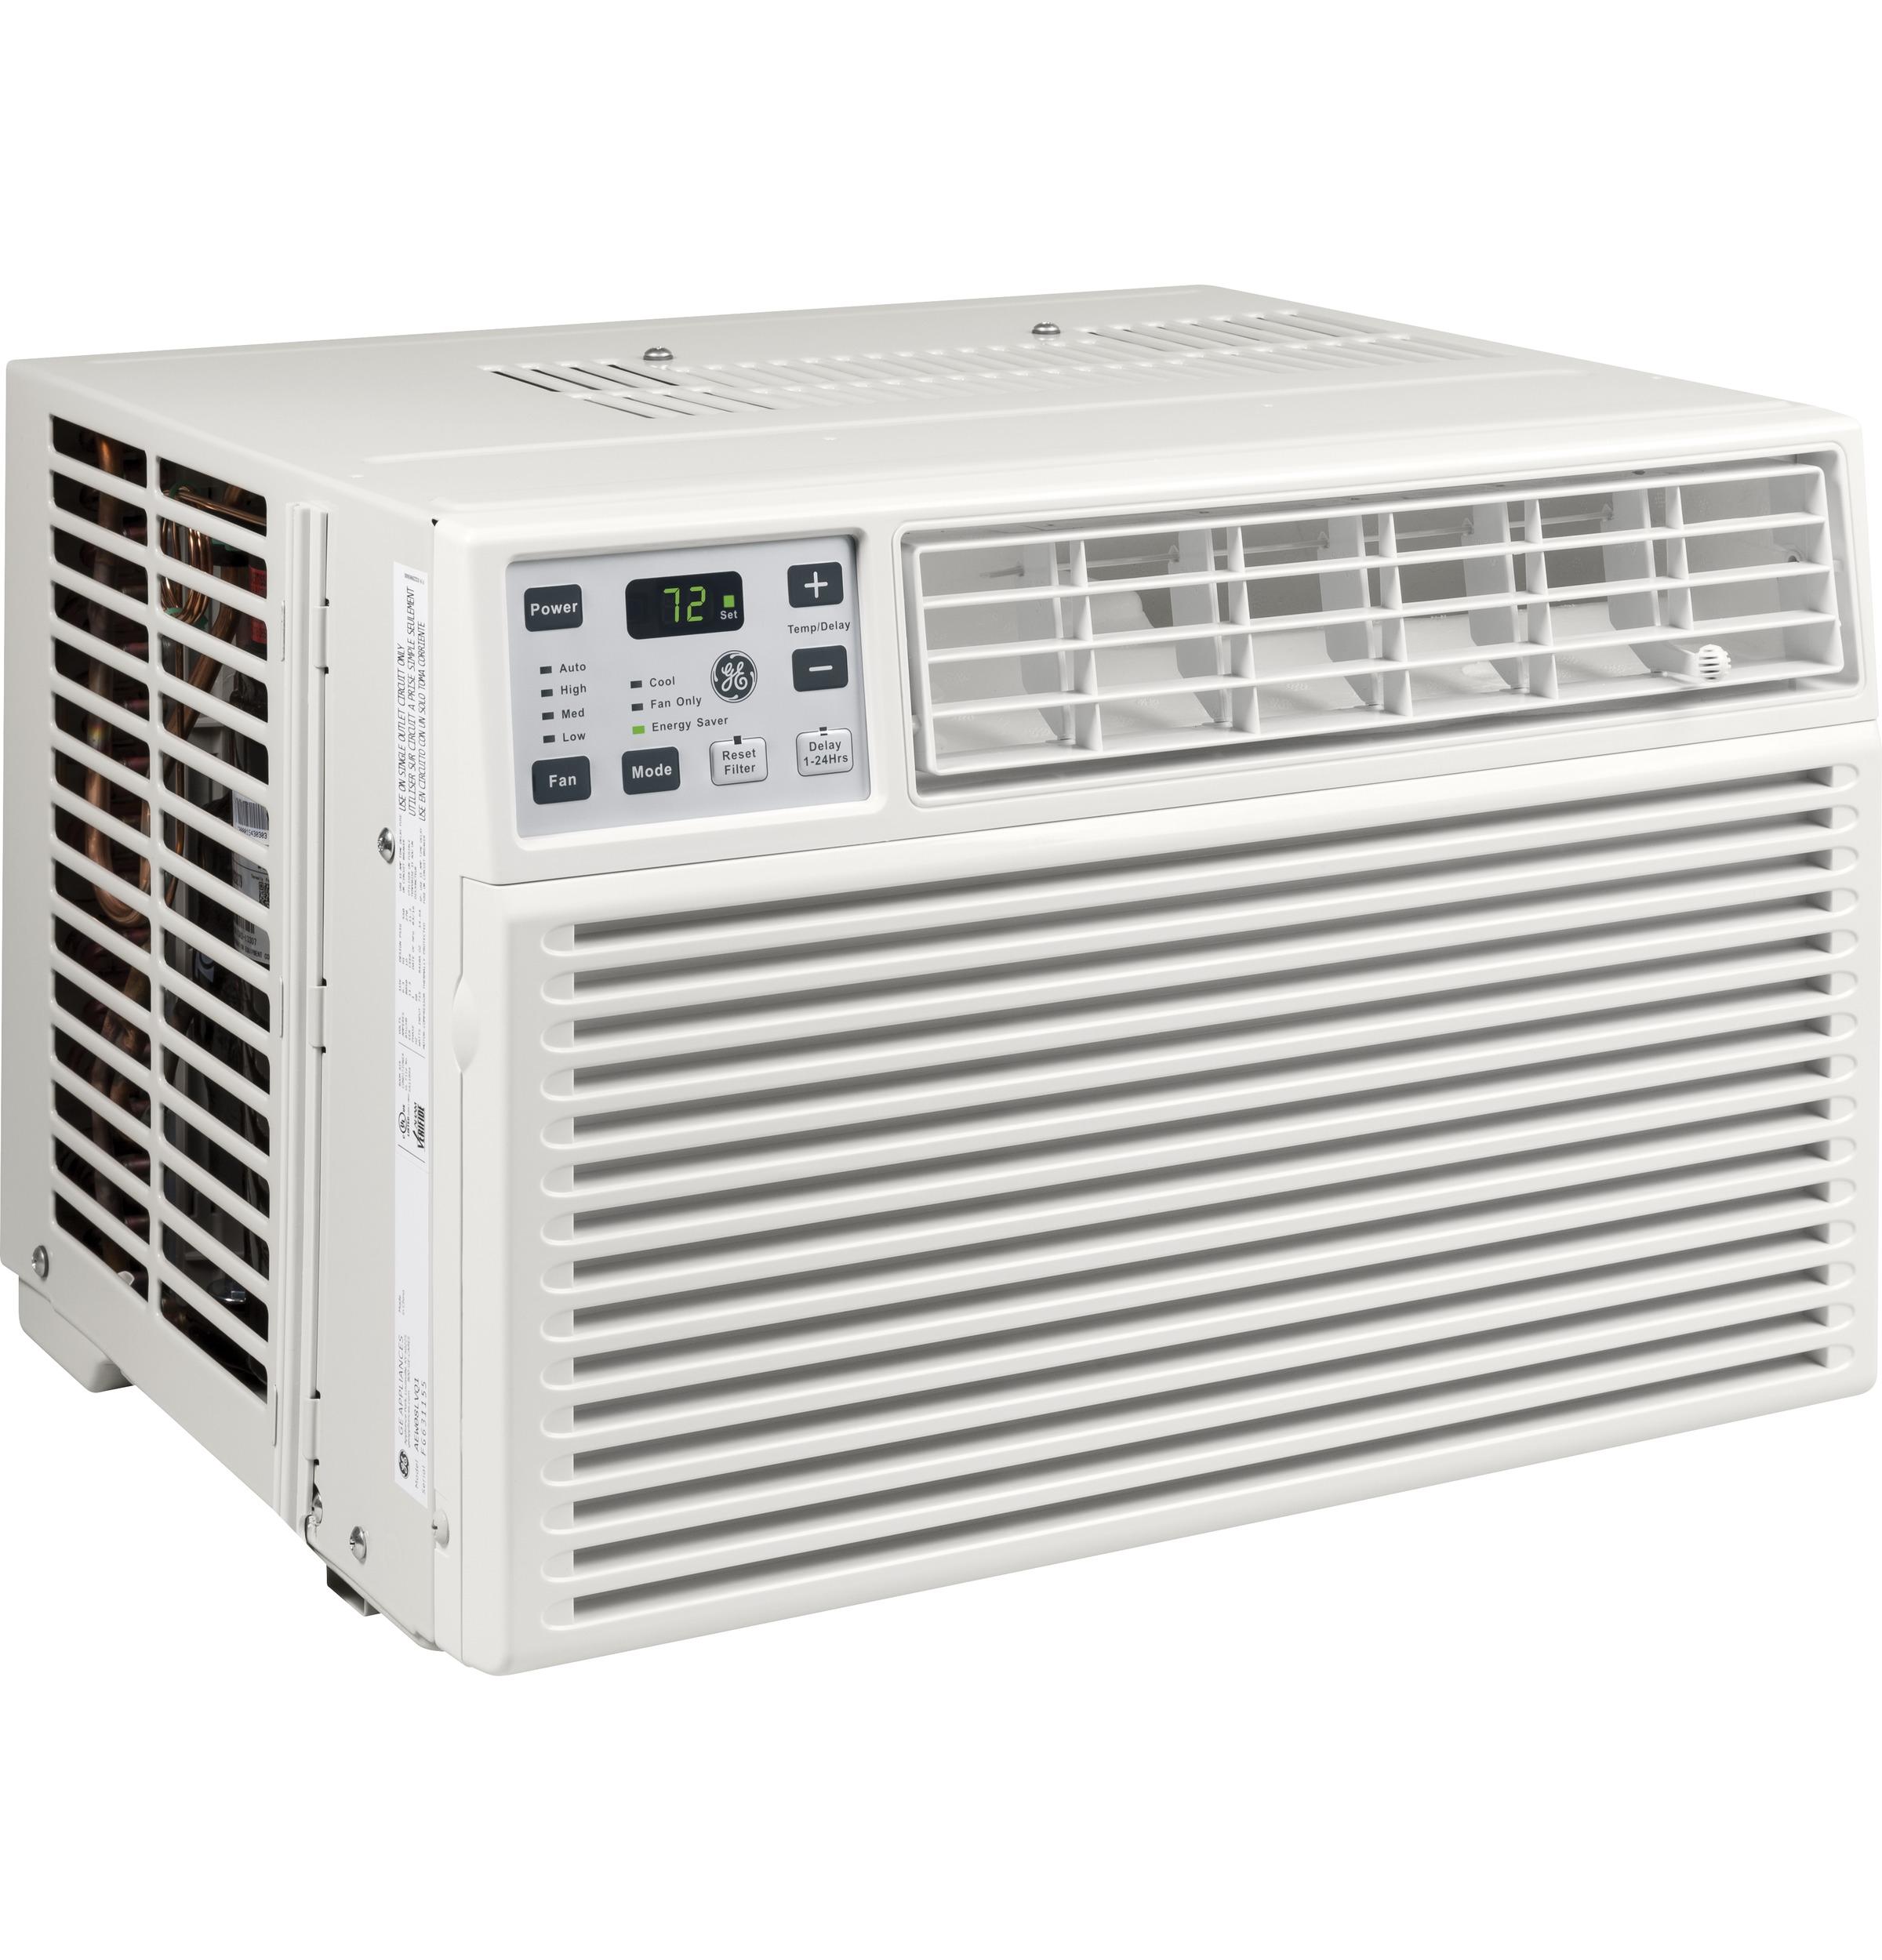 Ge 6,000 btu air conditioner with remote, aew06lx $139